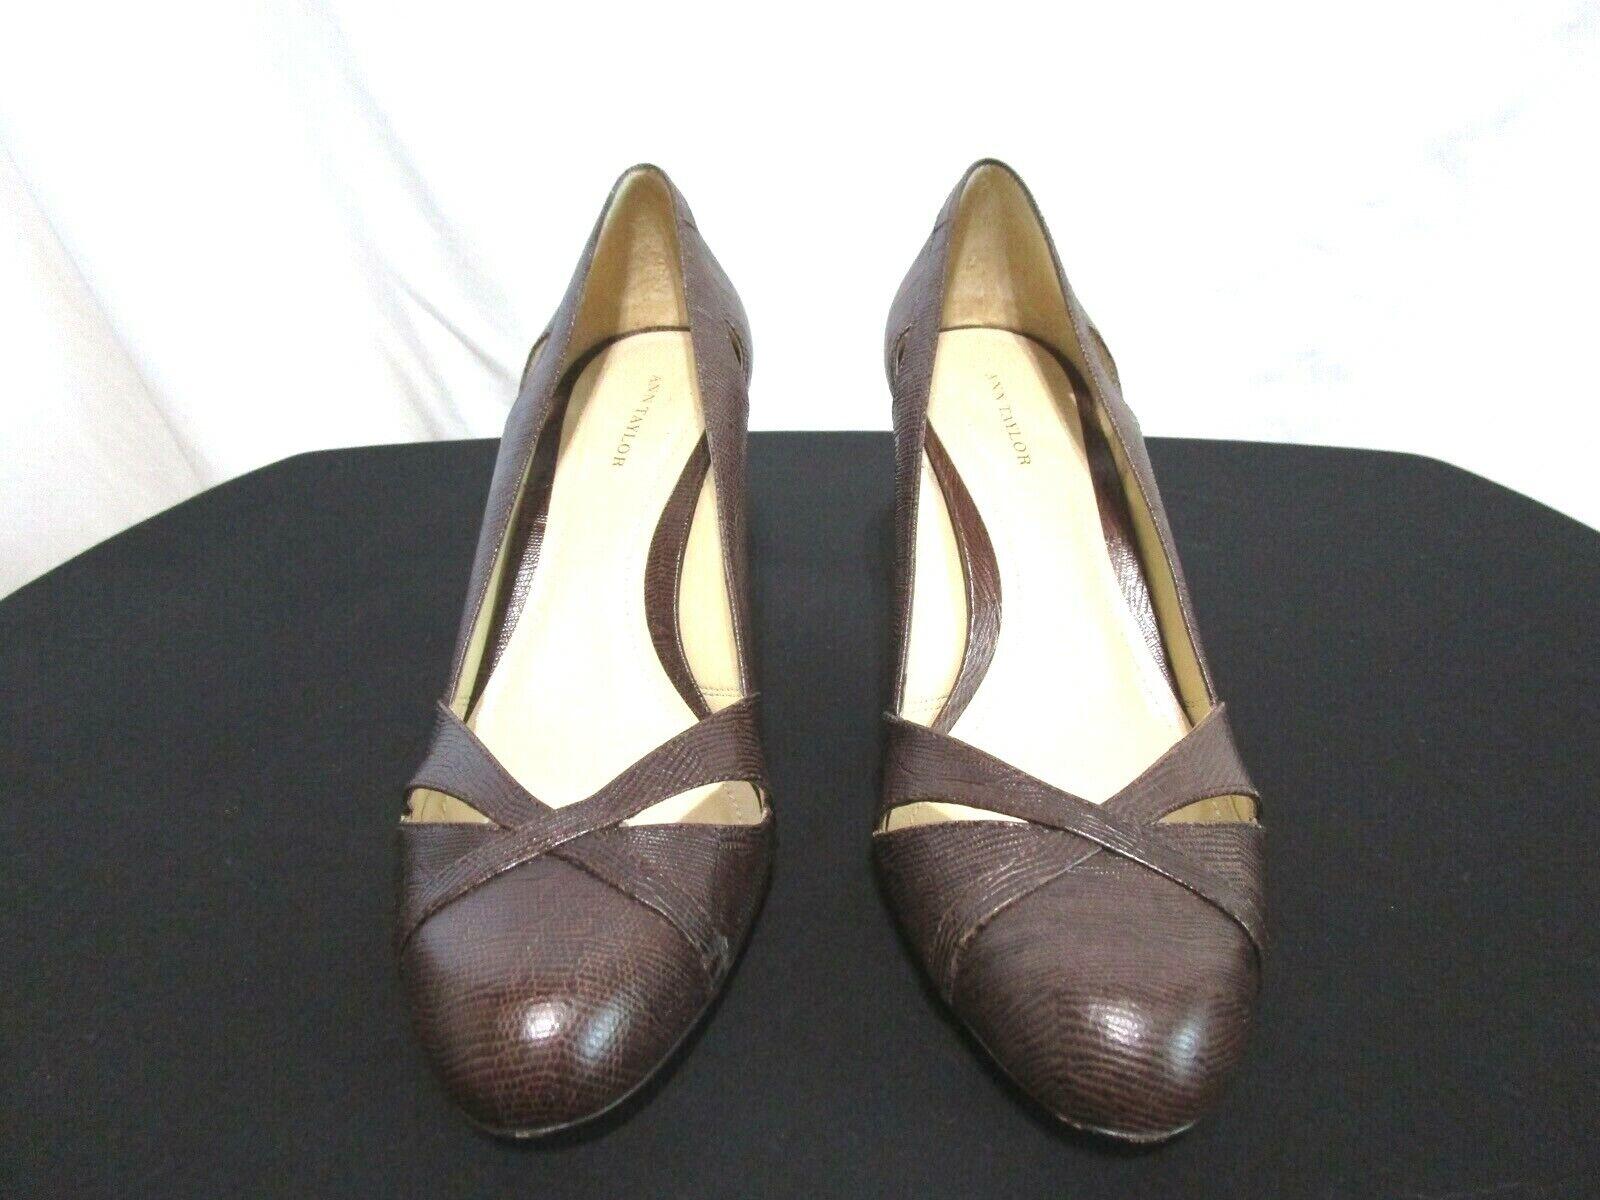 EUC! Ann Taylor Brown Lizard Leather Cut Outs High Heel Pumps Shoes Sz 8.5 M